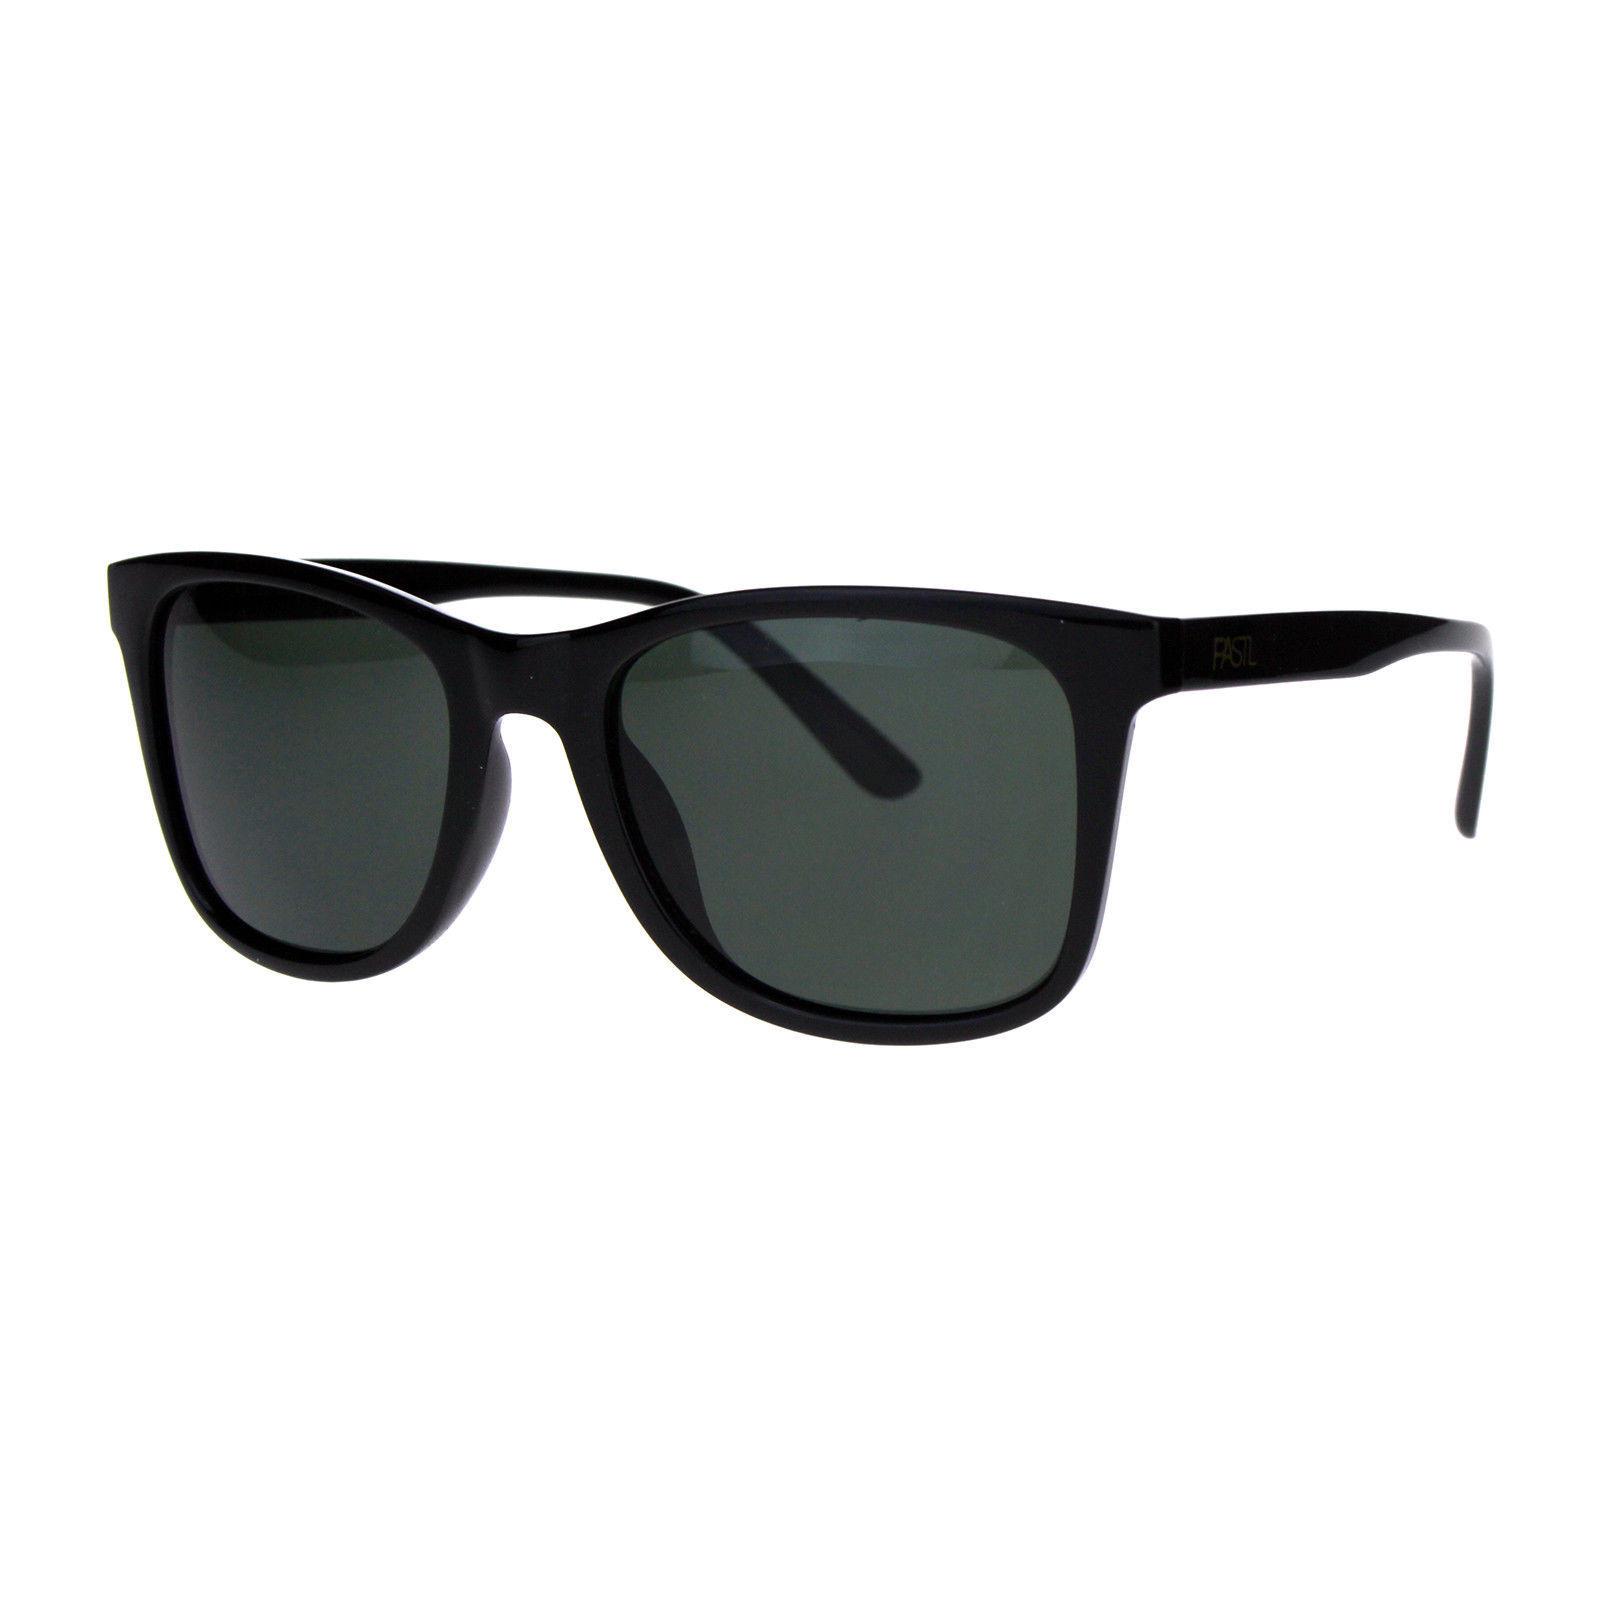 PASTL Sunglasses Polarized Lens Classics Square Designer Fashion Shades Black